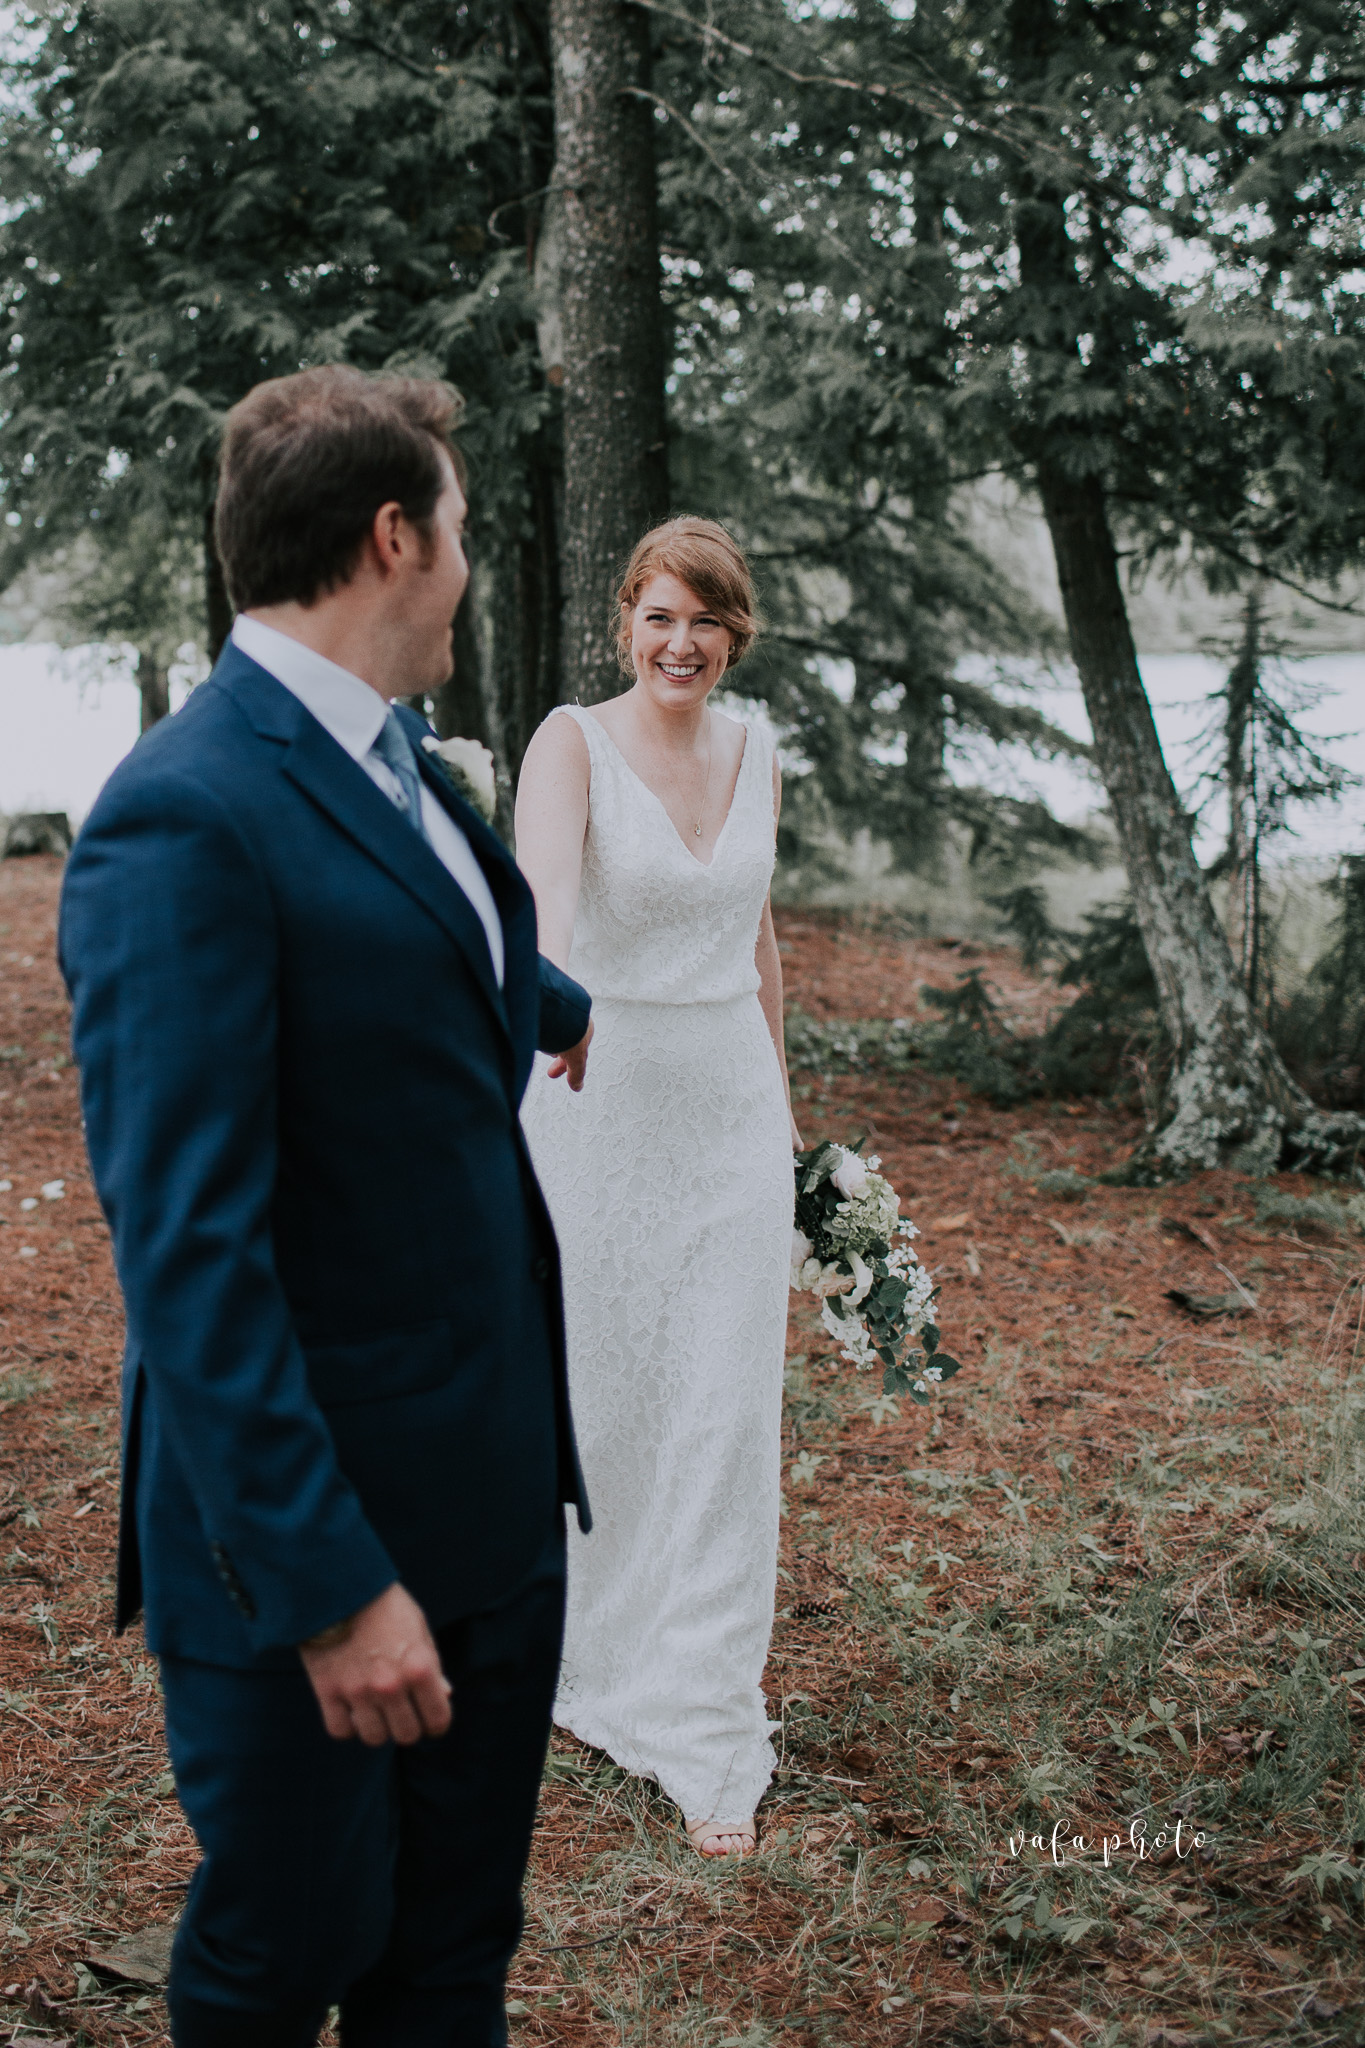 Michigan-Lake-House-Wedding-Madeline-Patrick-Vafa-Photo-563.jpg